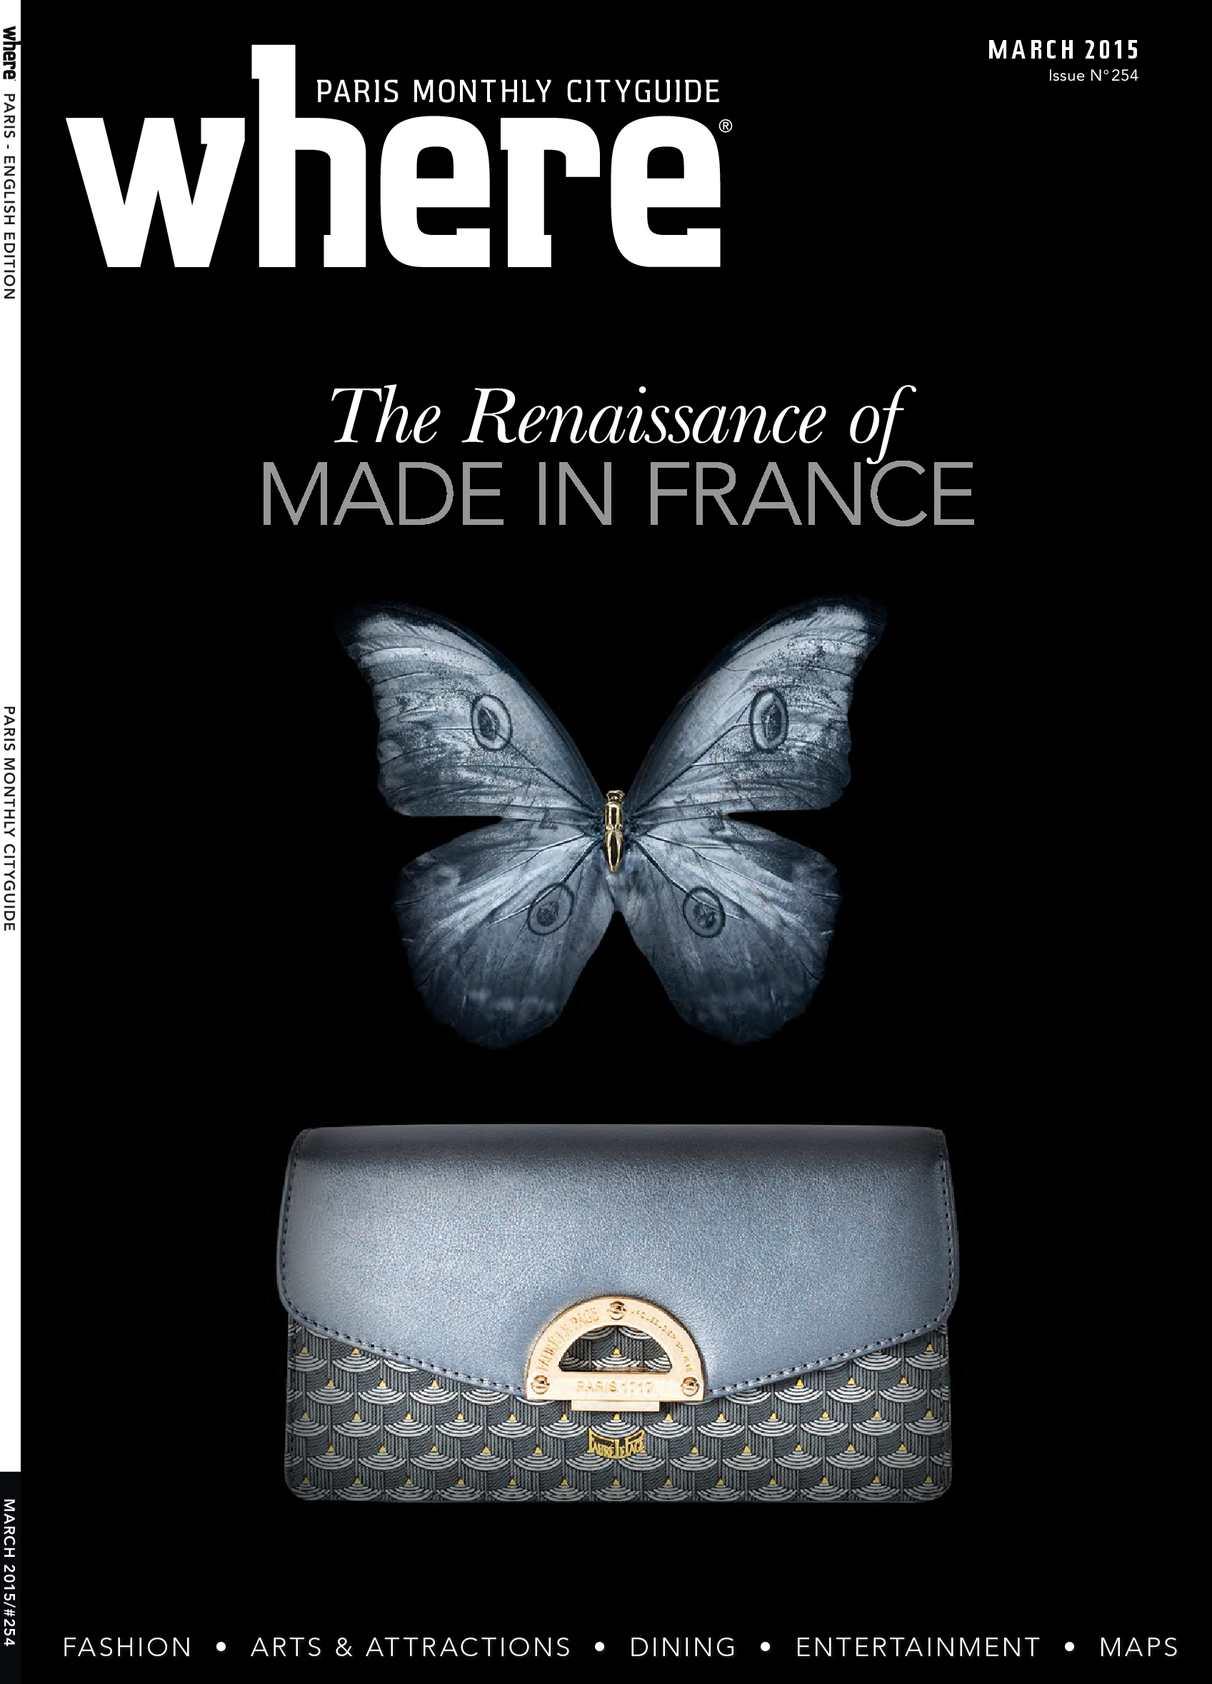 2c8d52aee Calaméo - Where Paris English Edition - March 205